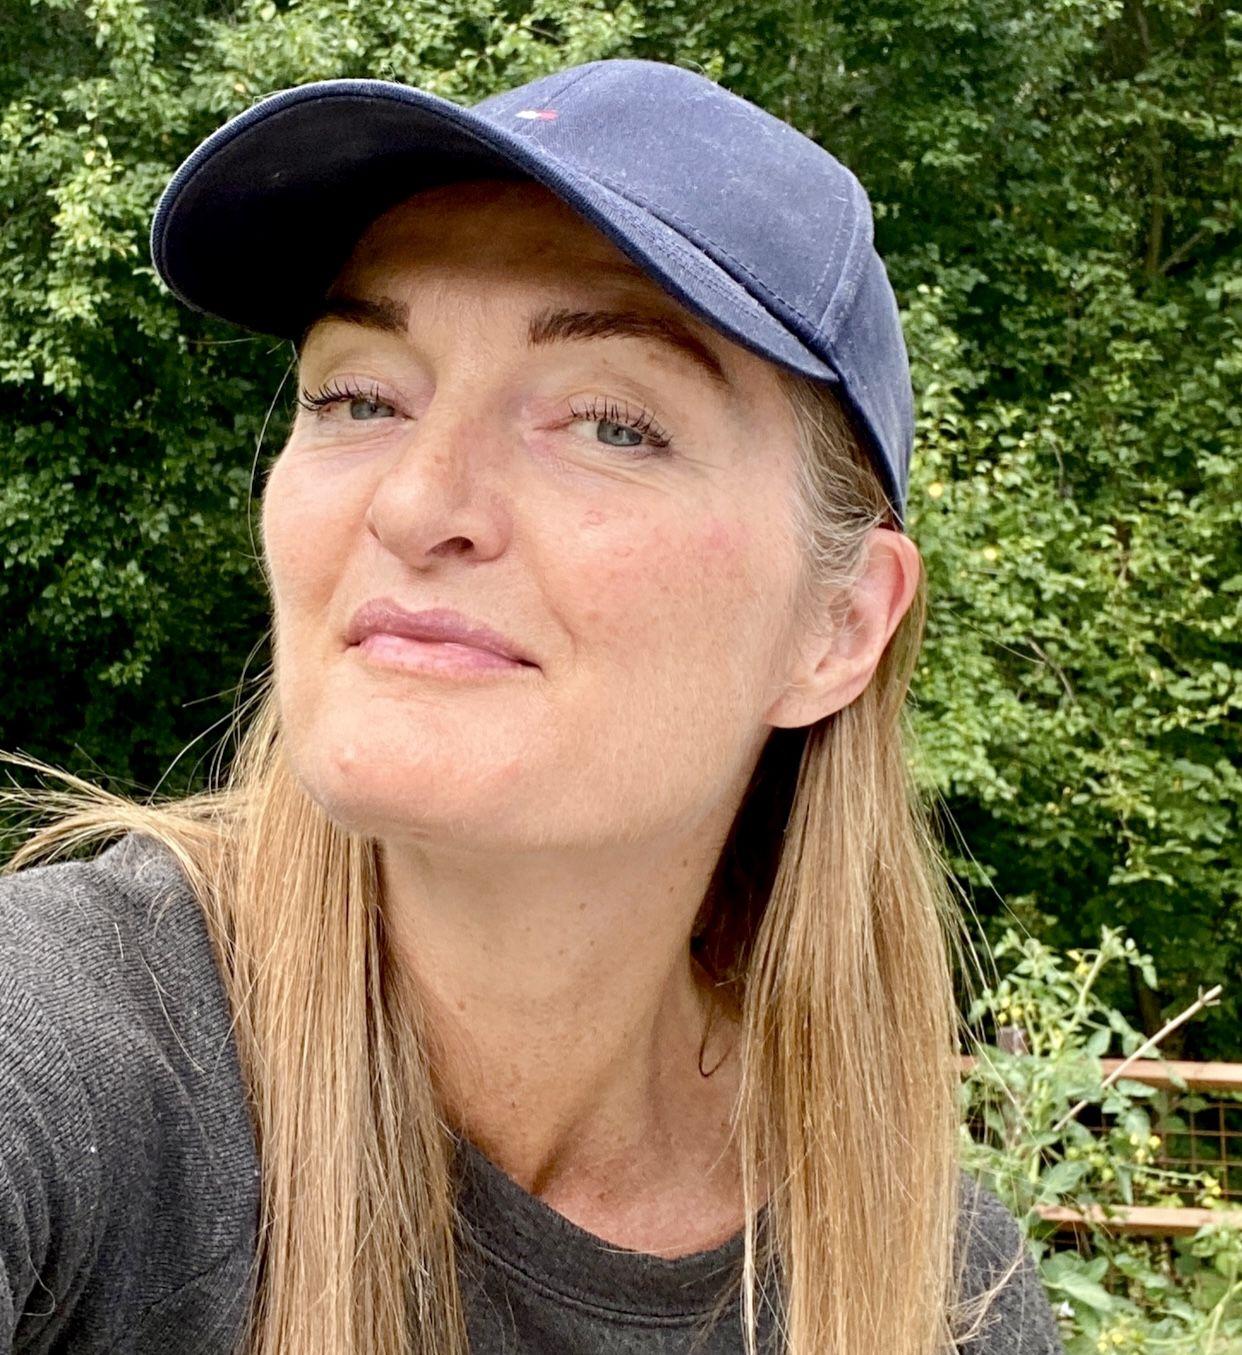 Jeanette Elmelund